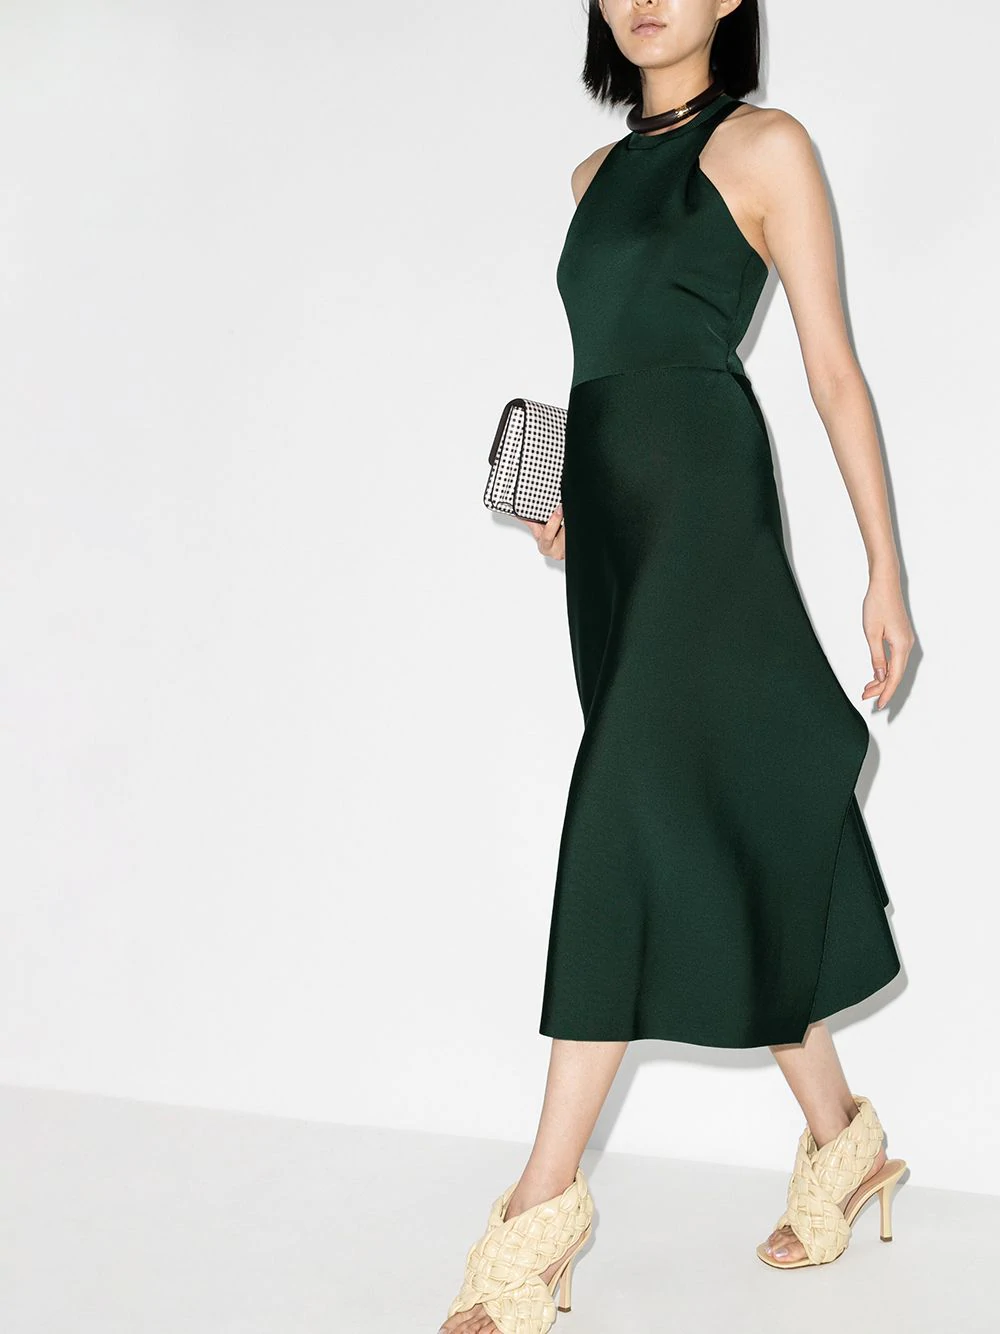 Victoria Beckham Racerback Midi Dress Farfetch Racerback Midi Dress Midi Dress Dresses [ 1334 x 1000 Pixel ]